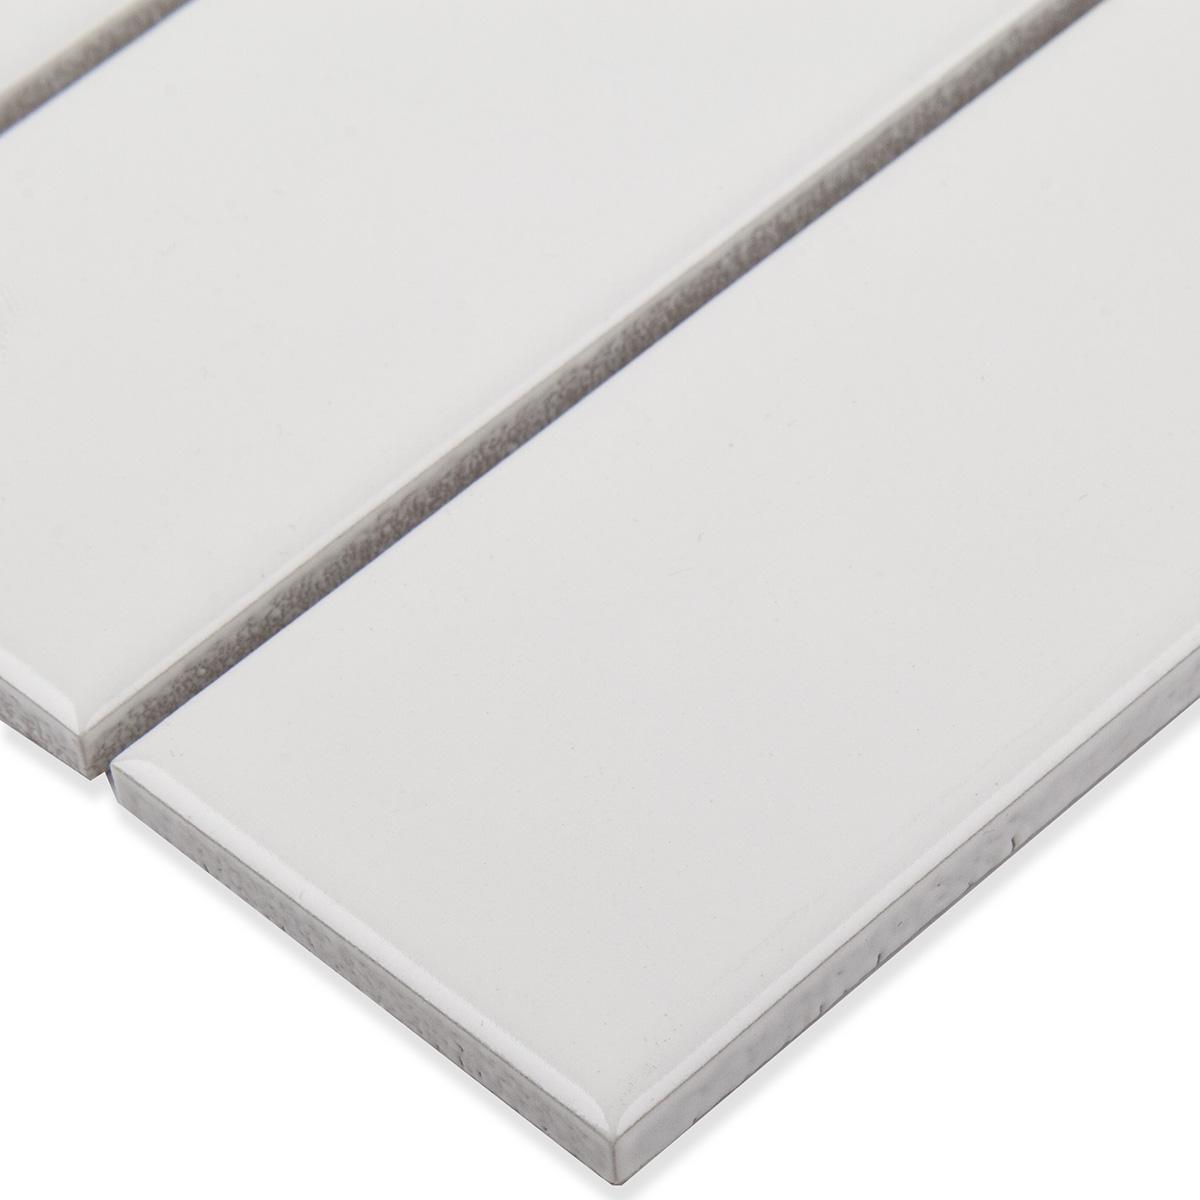 Керамическая мозаика 47x147 White Matt (V-VW56000) на сетке 300х300x6 мм из коллекции Brick & Metro.